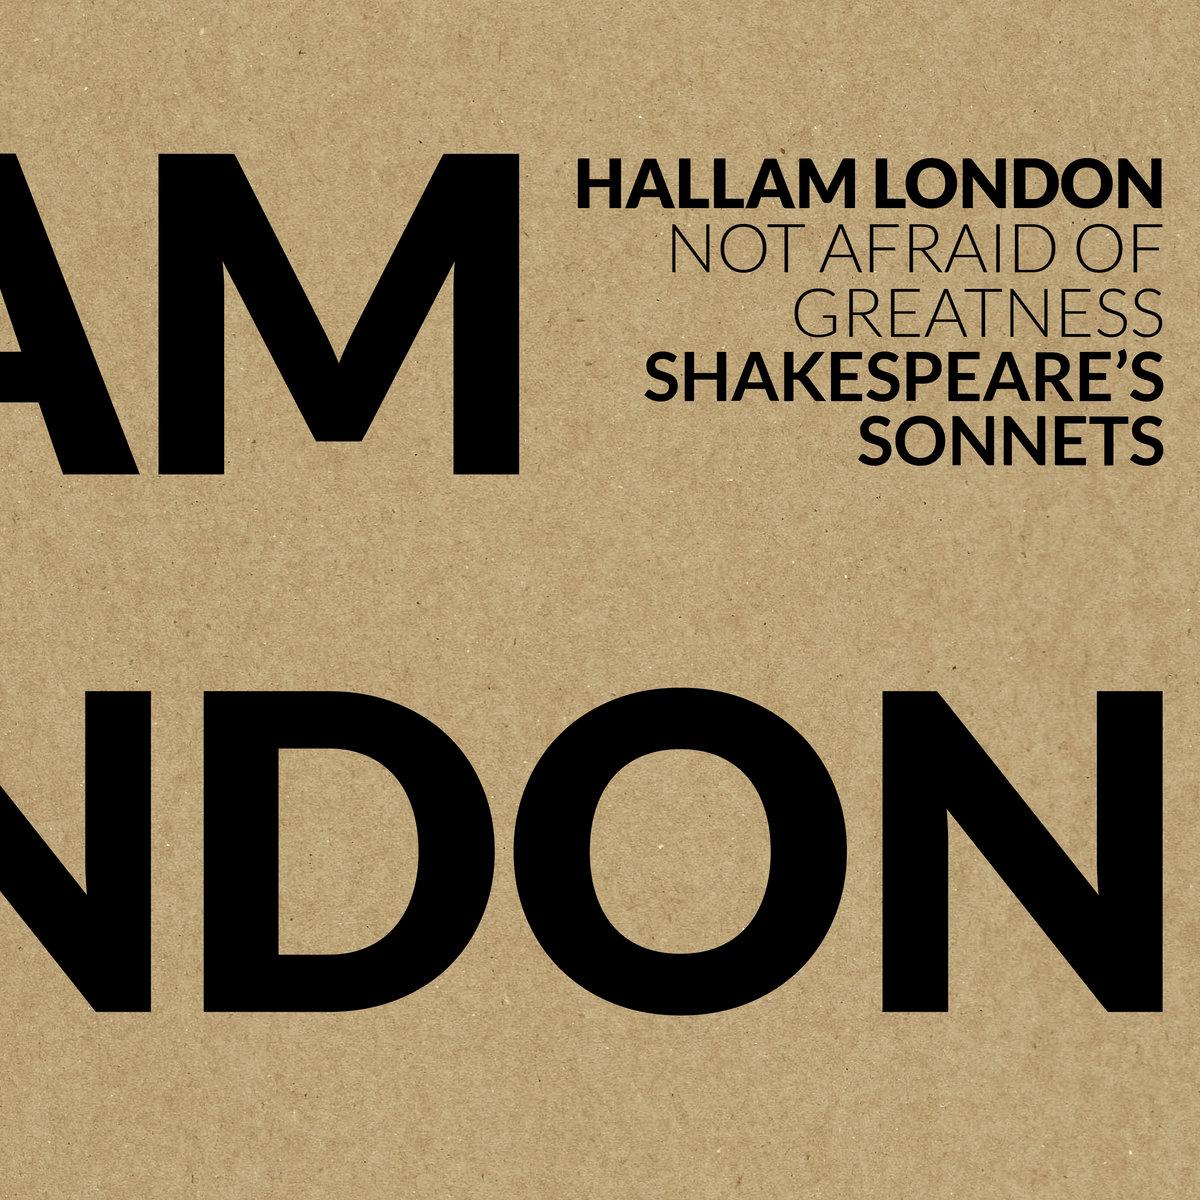 greatness of shakespeare